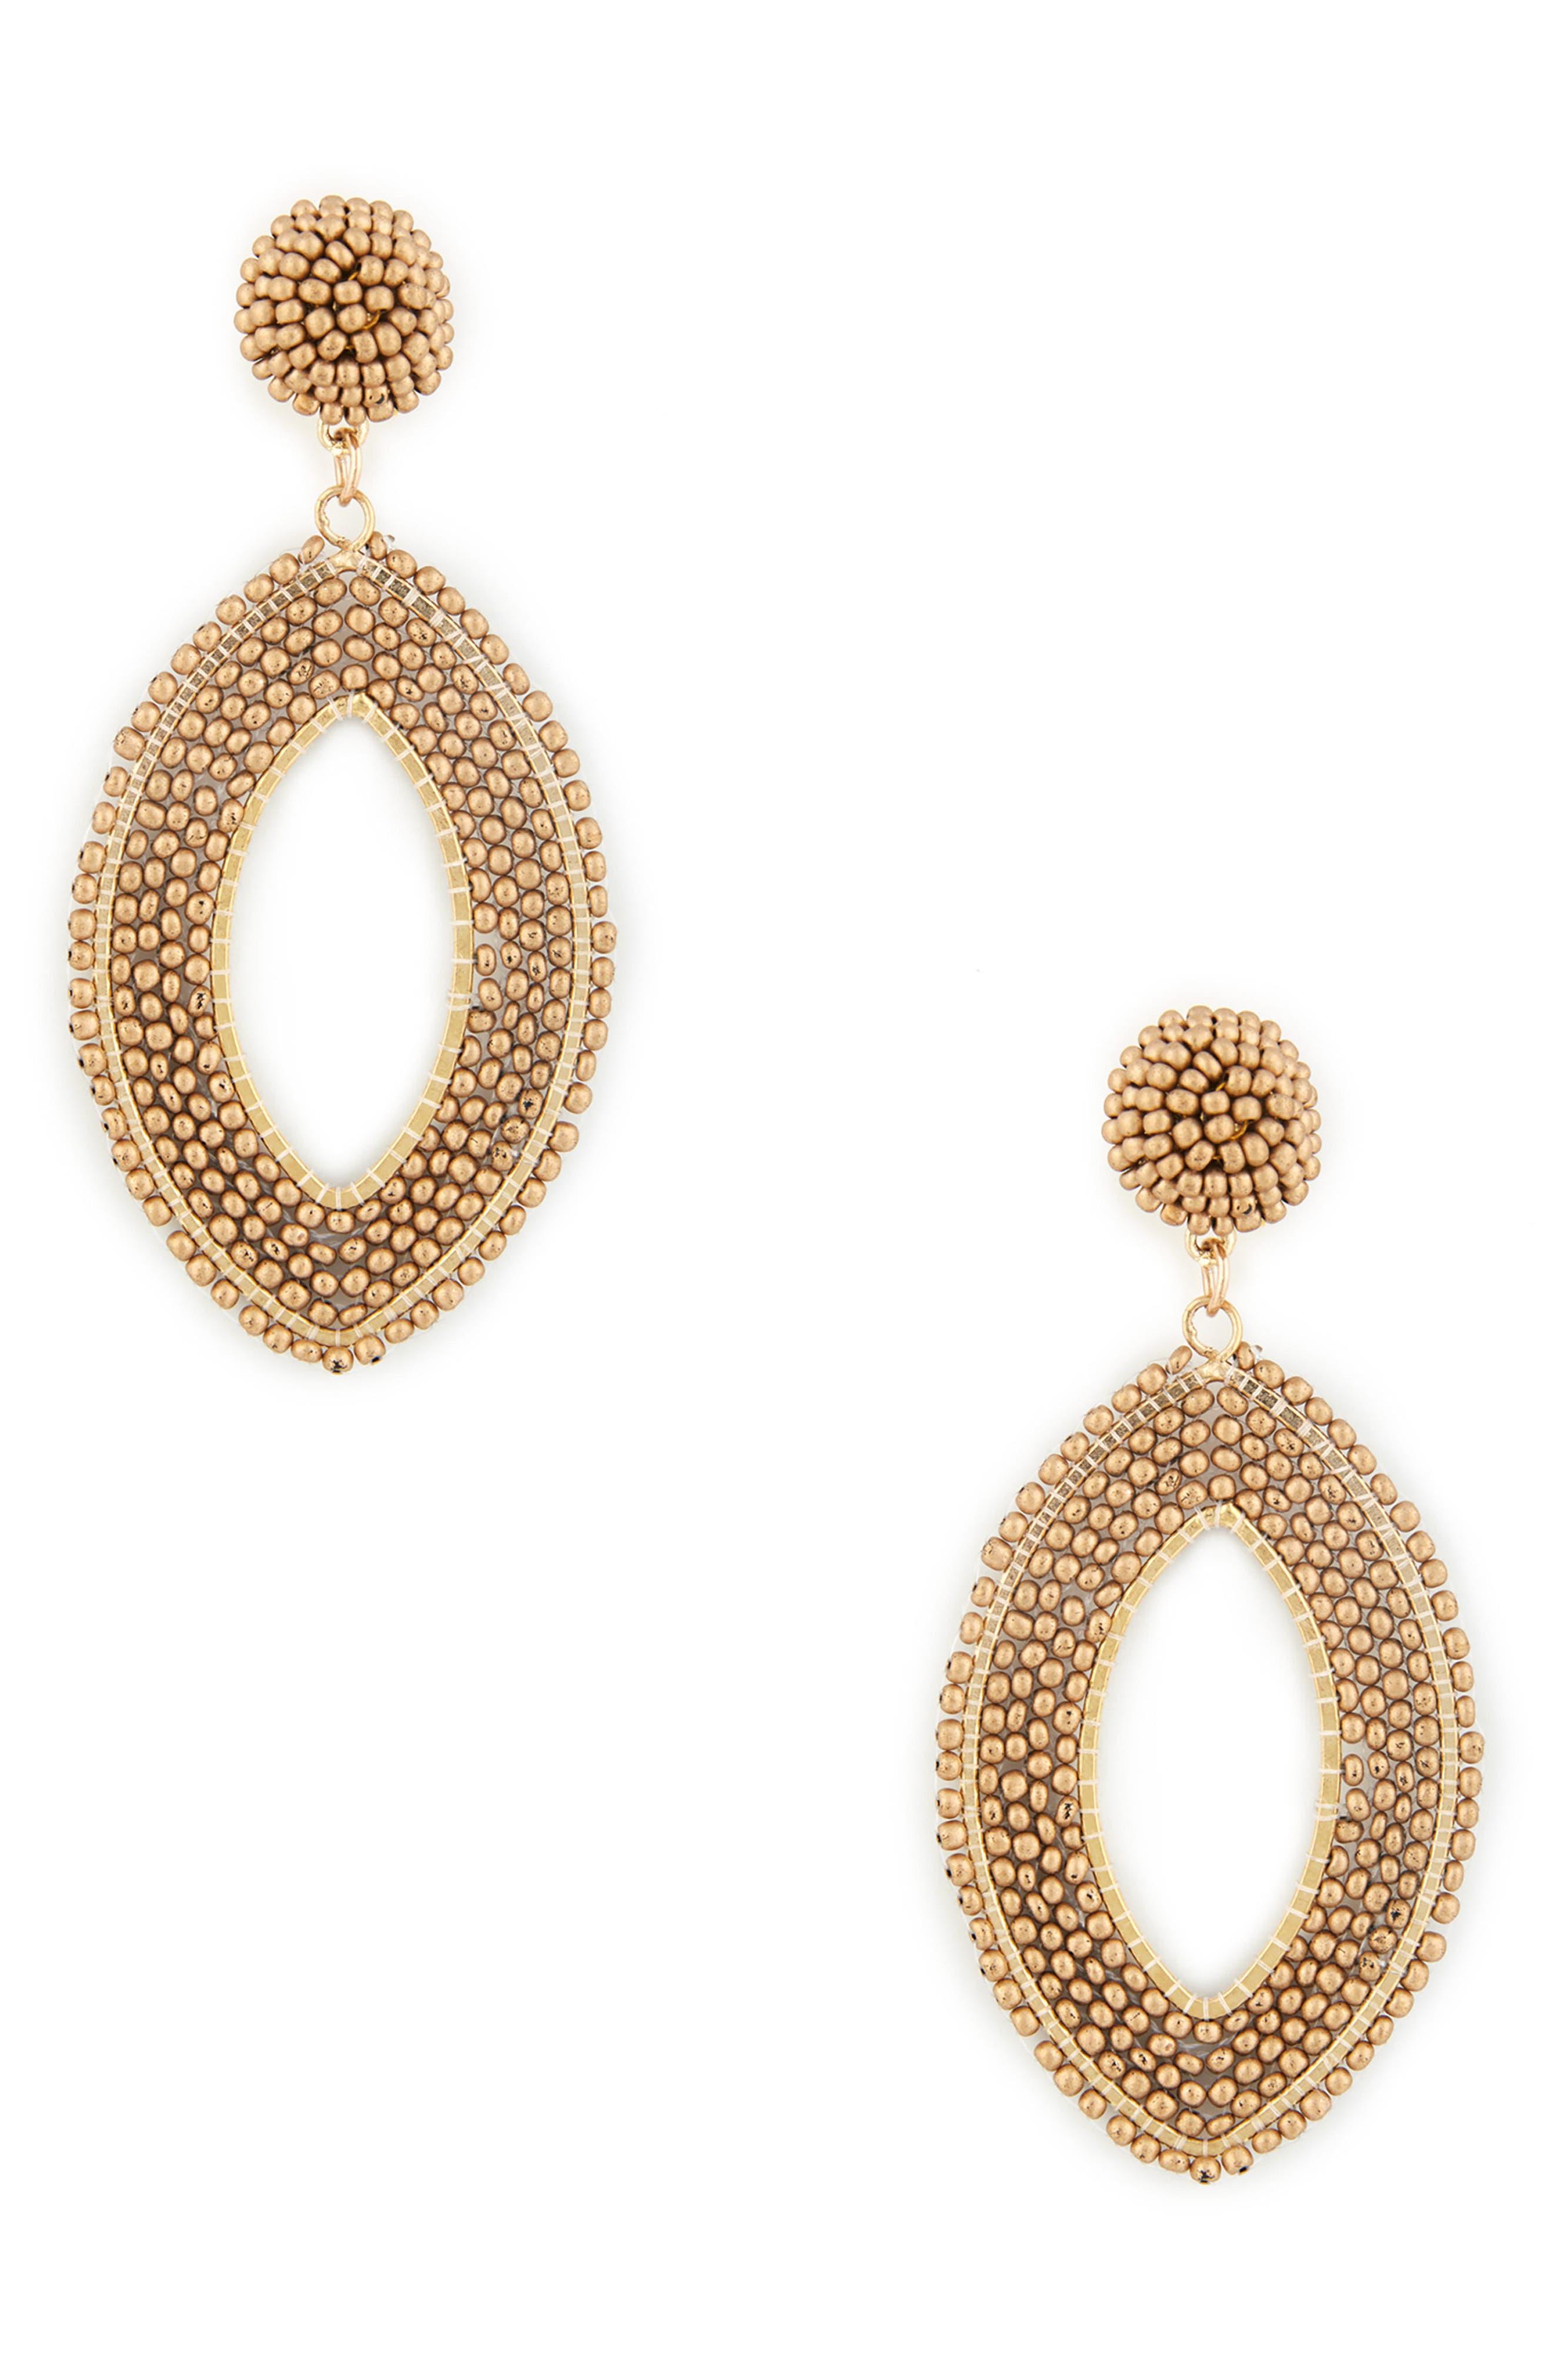 Main Image - Sole Society Beaded Tier Drop Earrings